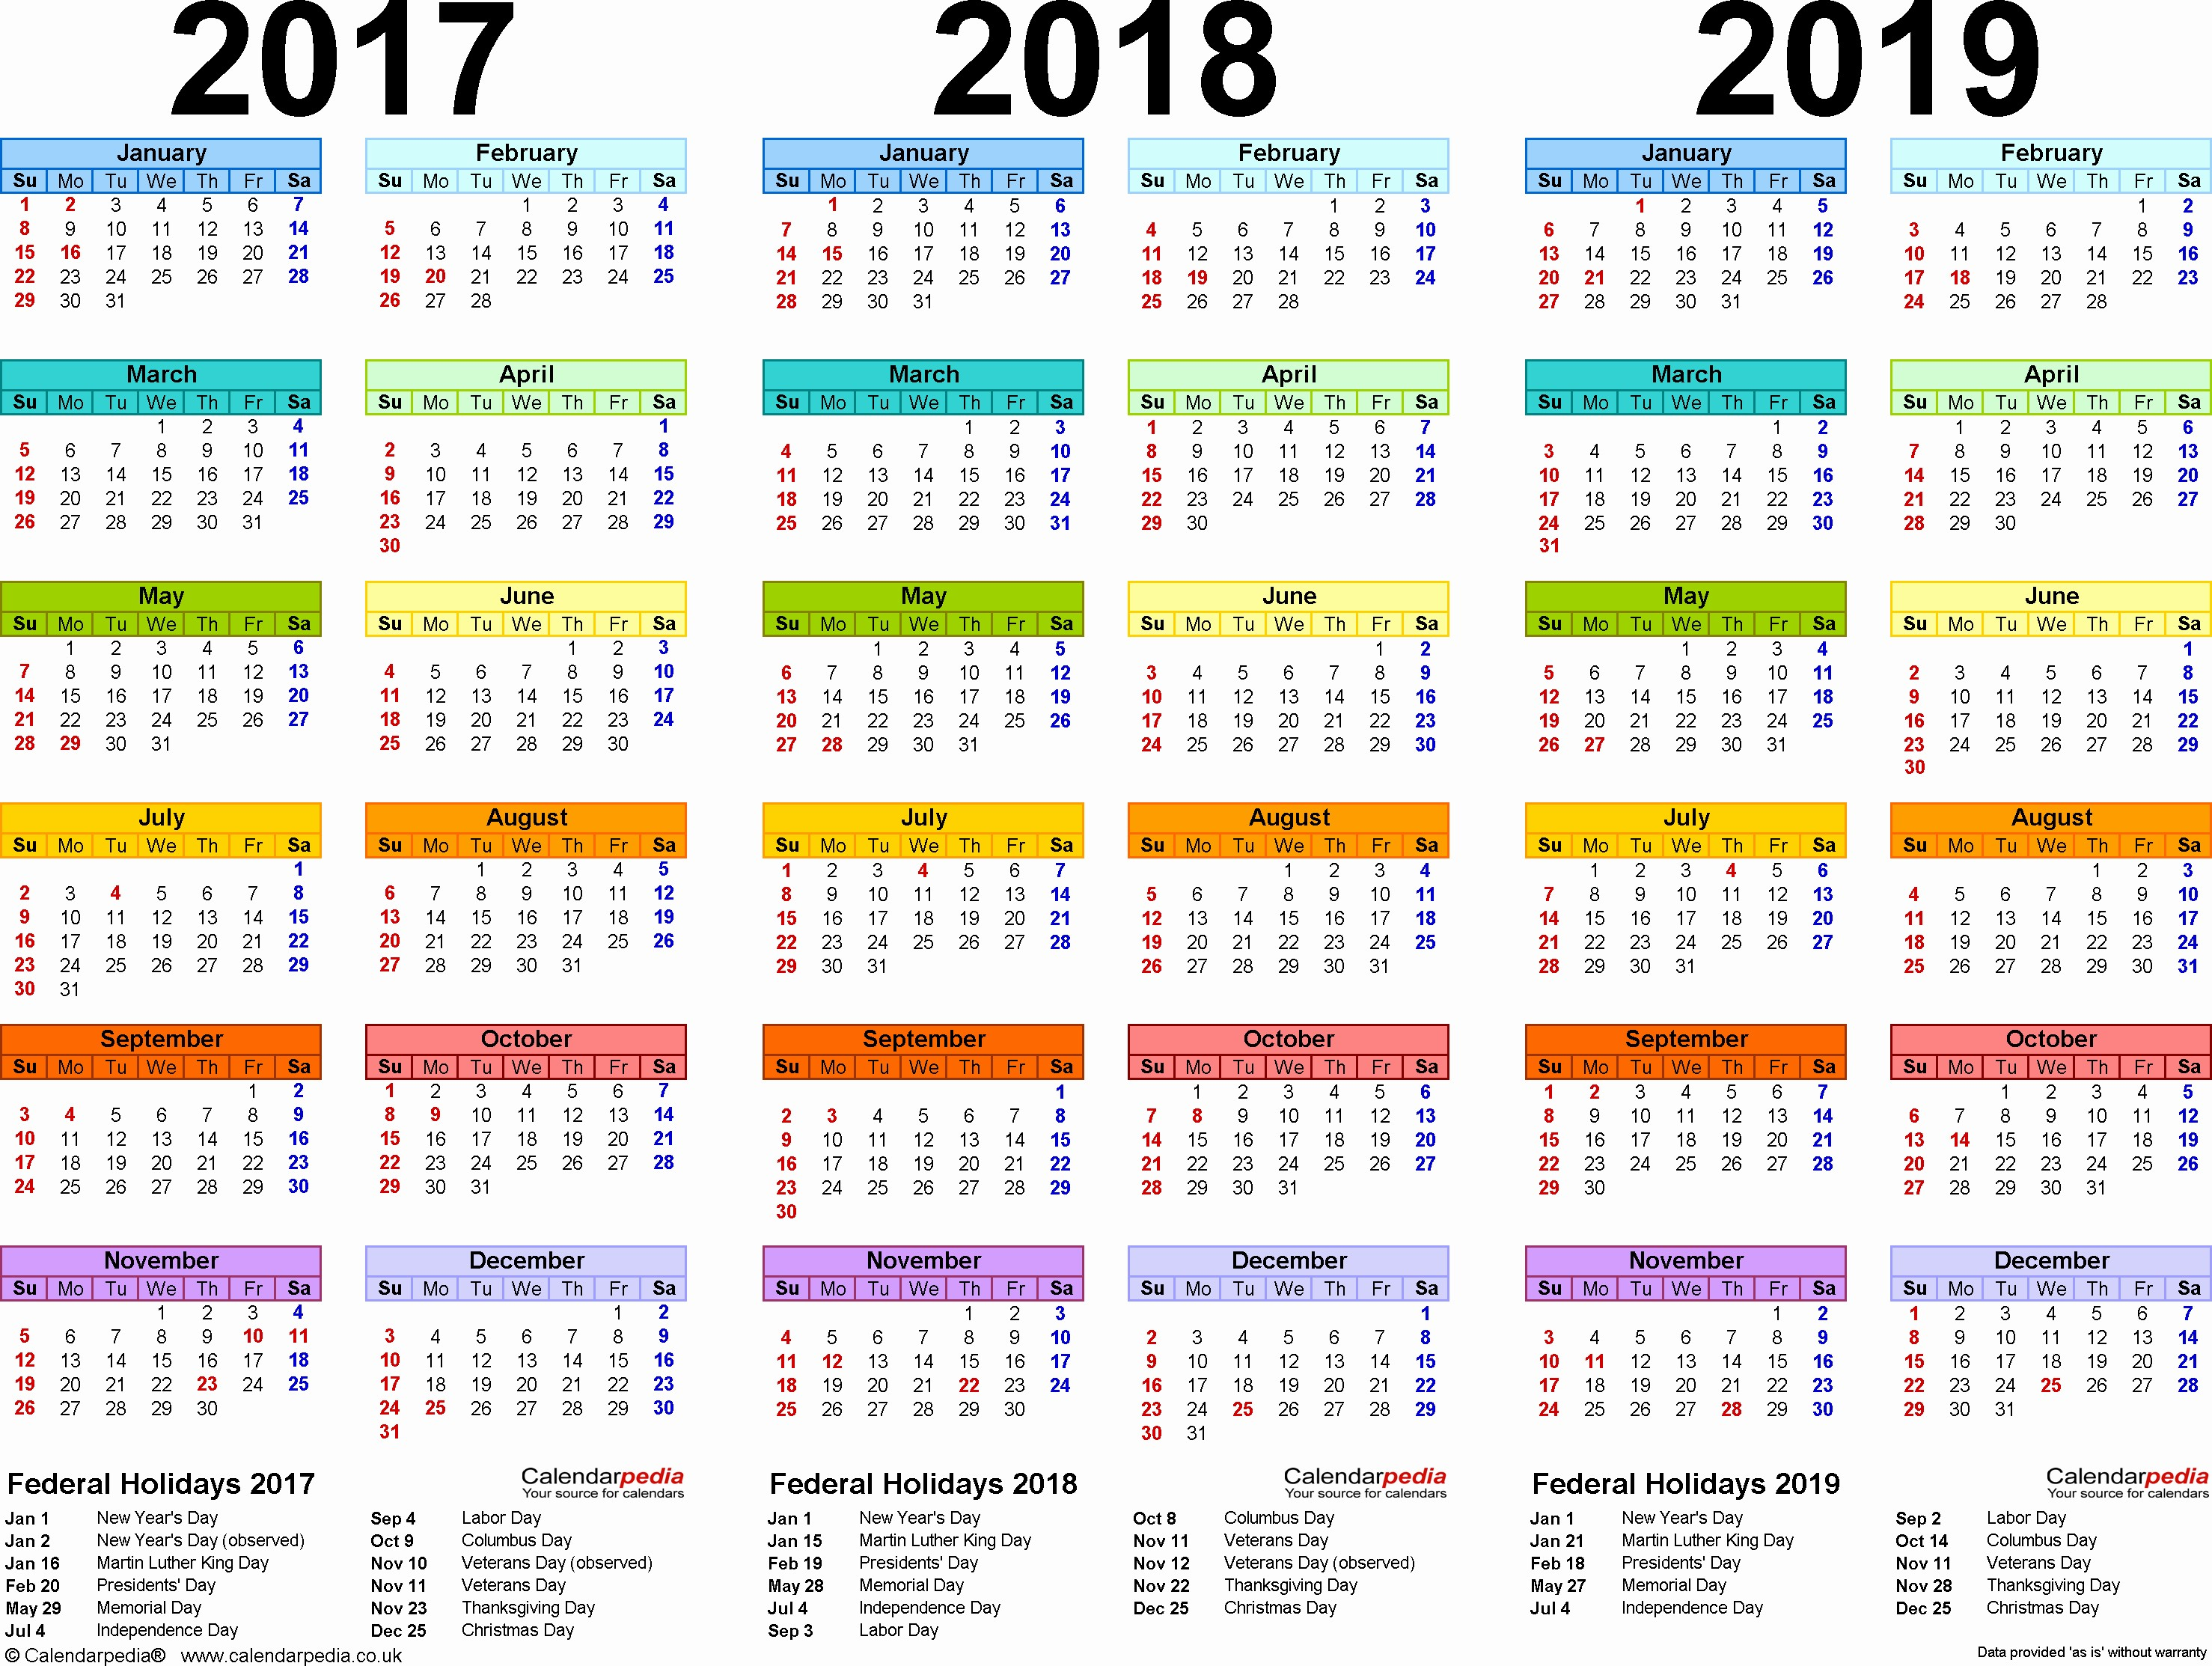 Kalender 2019 Excel Erstellen Mejores Y Más Novedosos Calendrier Bayern 2019 Calendar Uk 2018 Calendar Printable Of Kalender 2019 Excel Erstellen Más Actual Excel Monatskalender Erstellen Elegant Excel Kalender 2019 Download